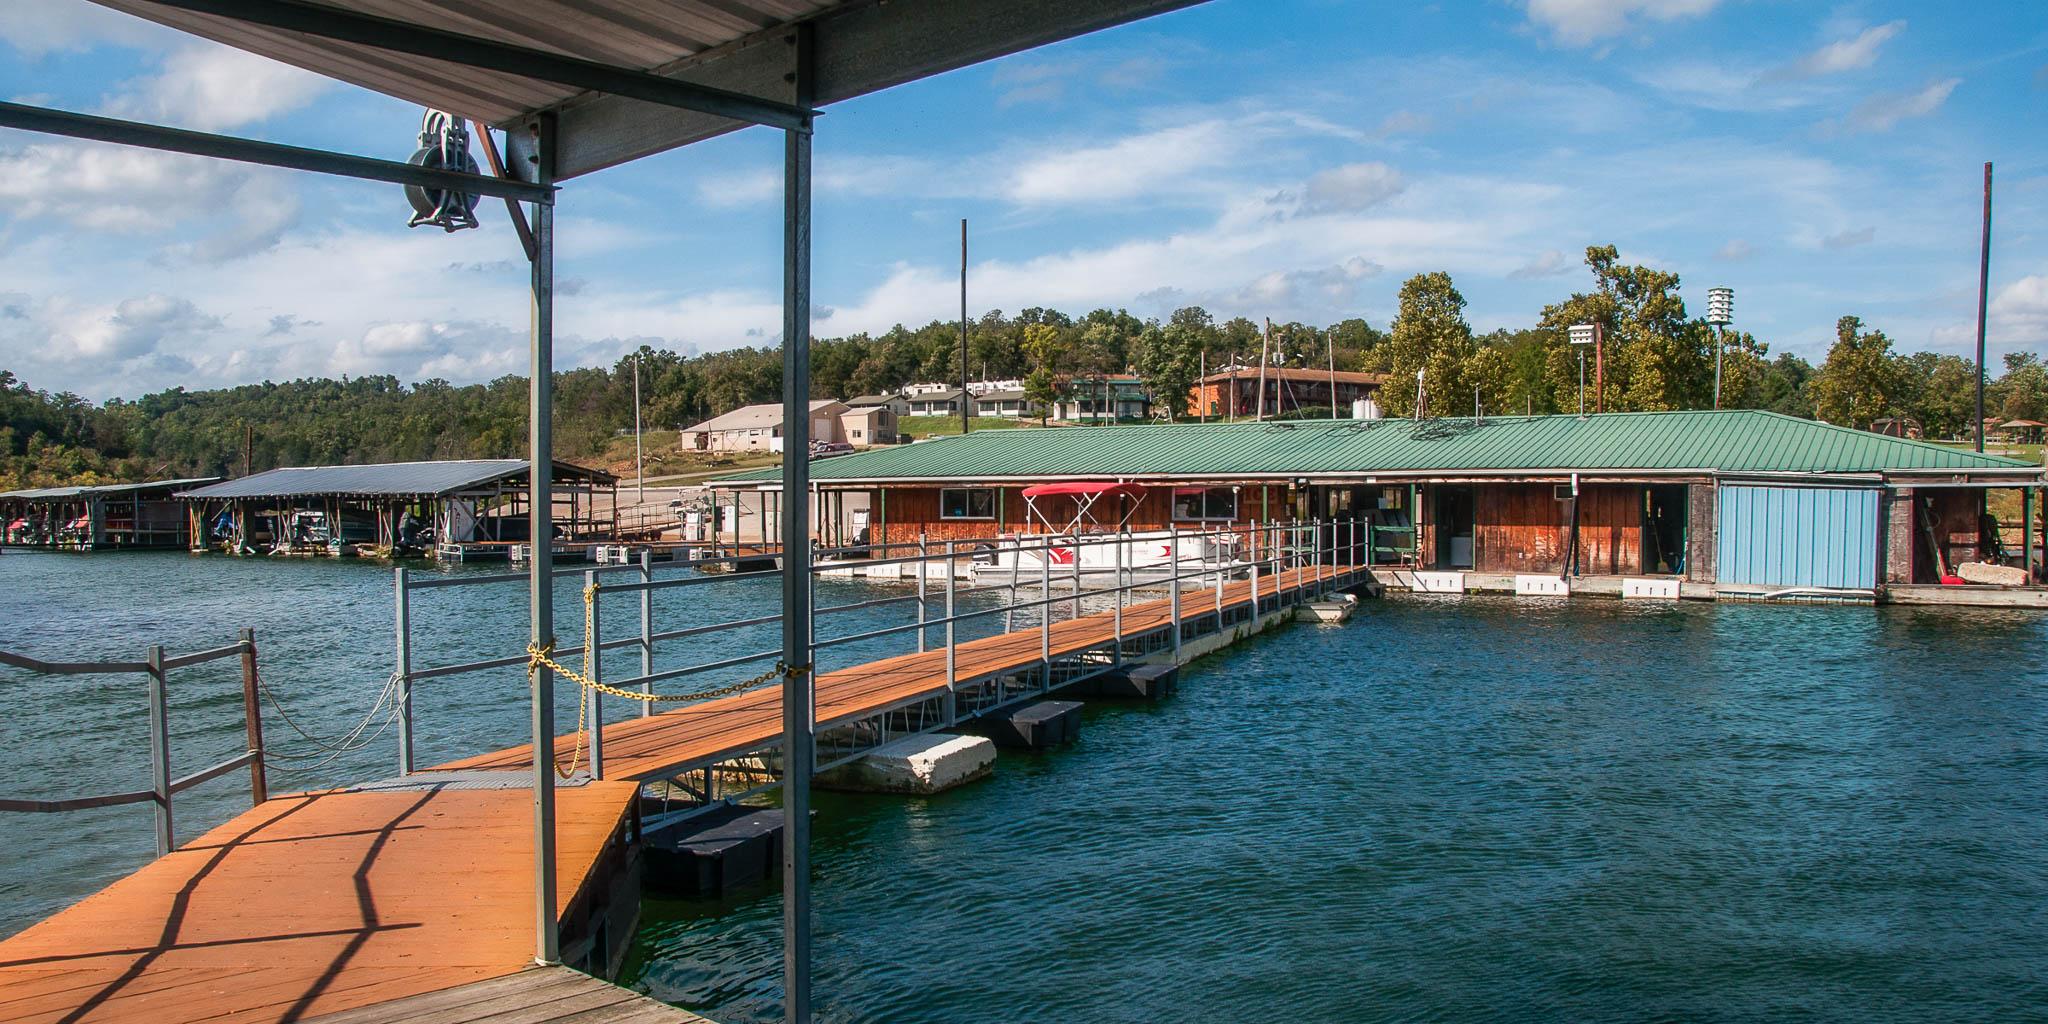 Theodosia Marina-Resort bait and tackle shop for a fishing vacation on Bull Shoals Lake